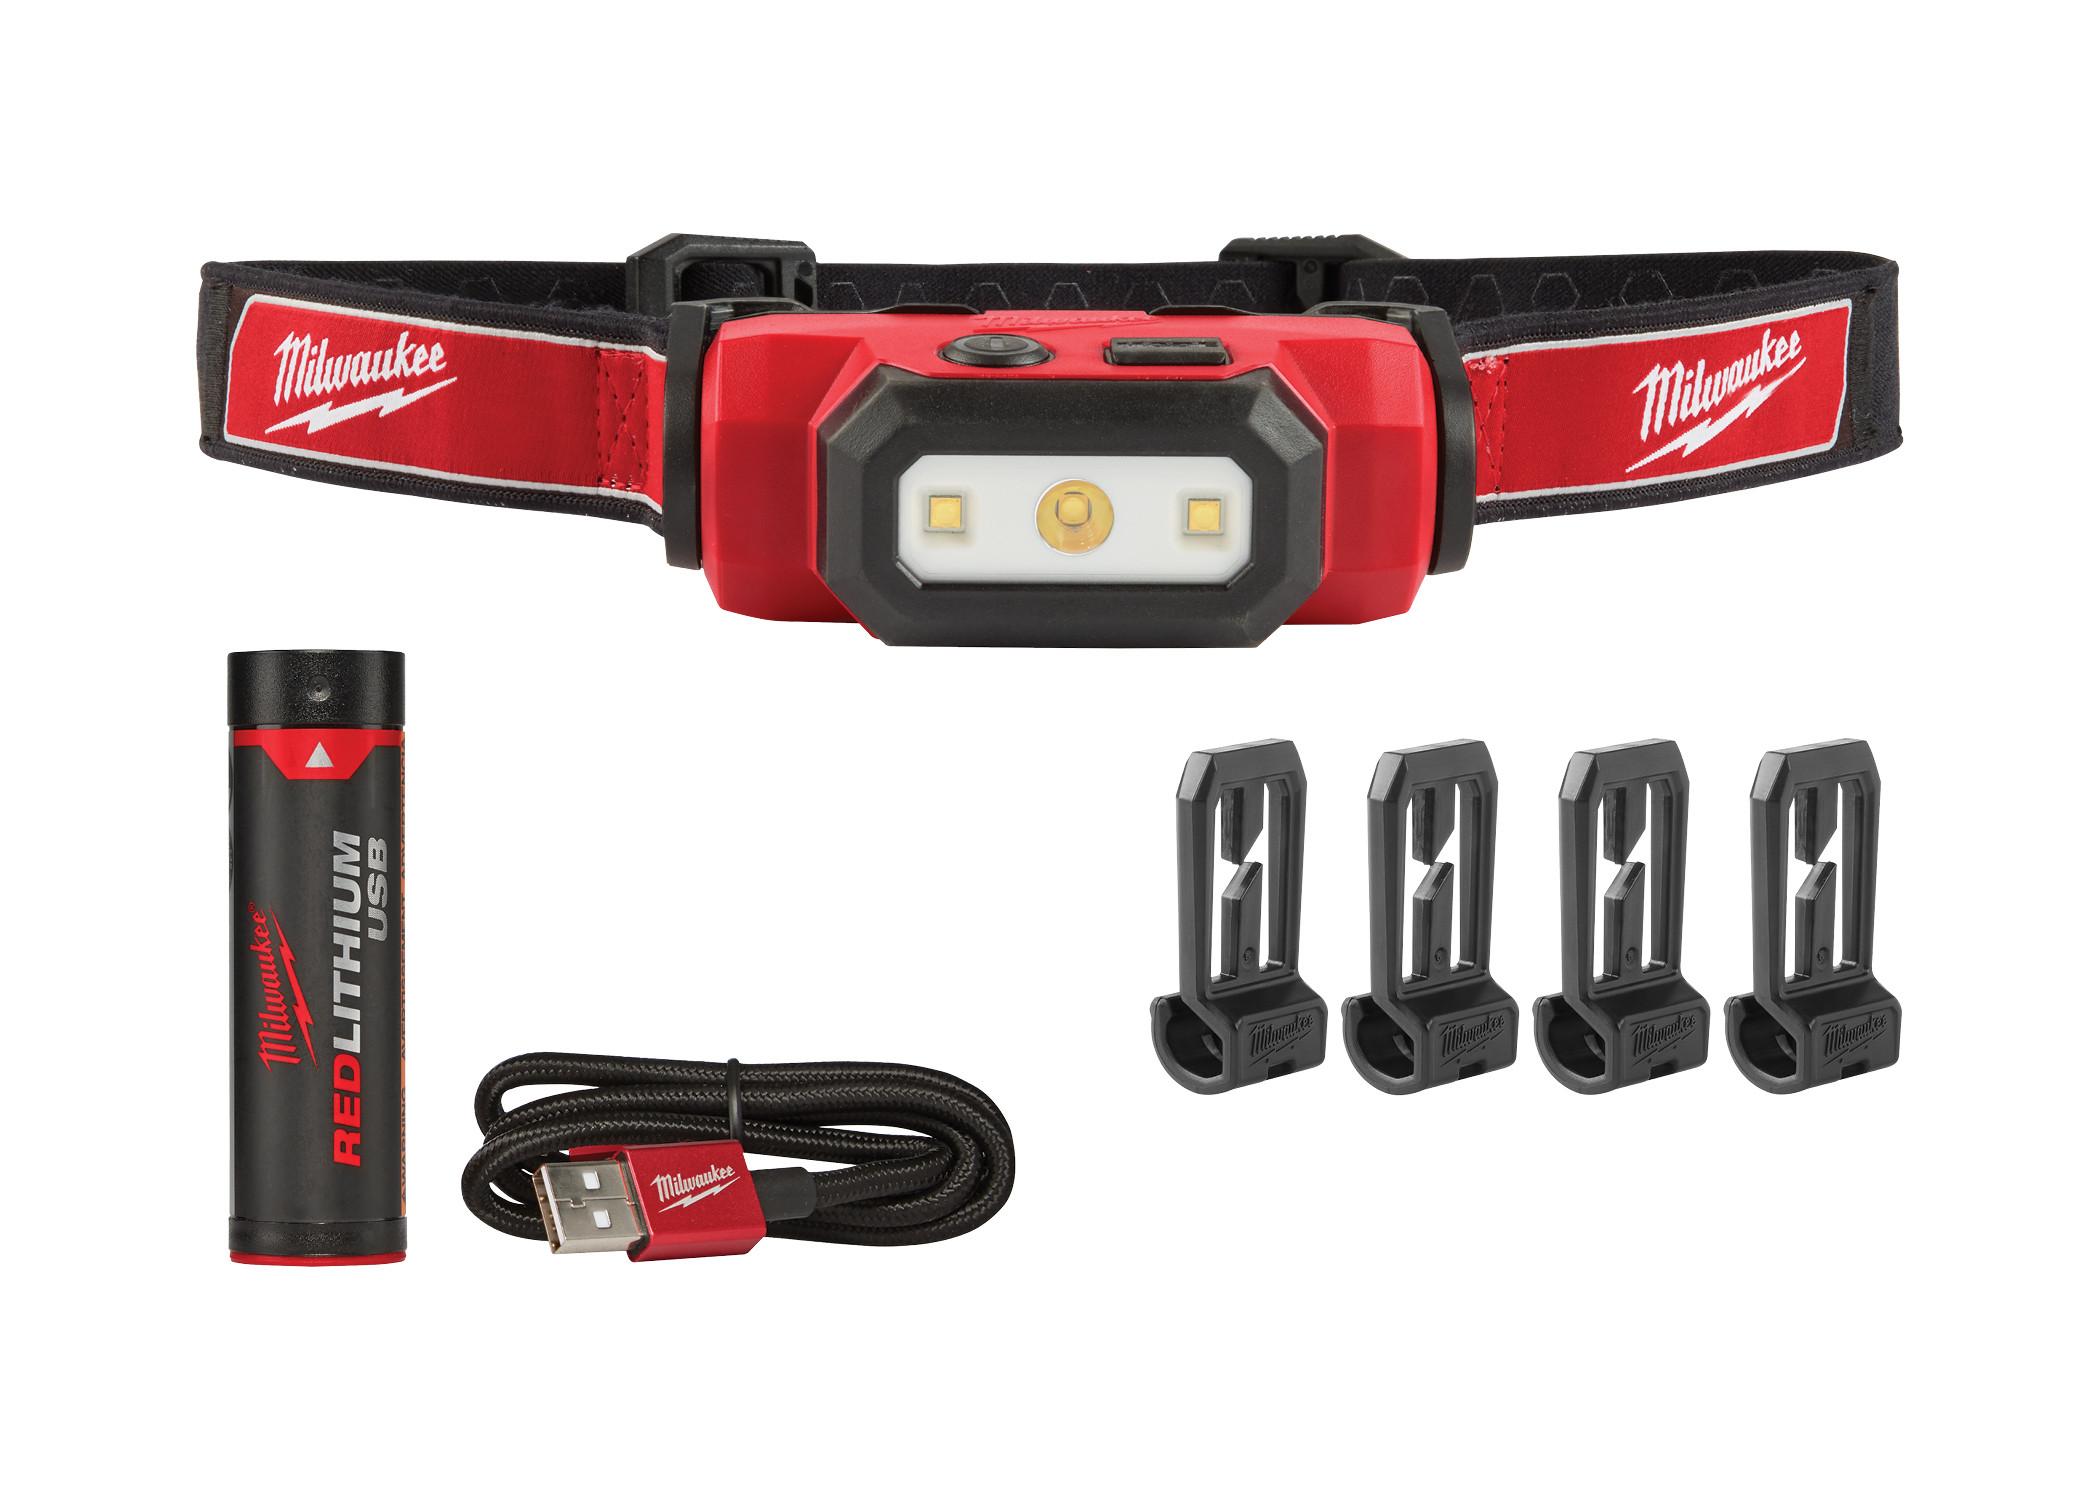 Milwaukee® 2111-21 Hard Hat USB Rechargeable Headlamp, LED Bulb, Plastic Housing, 475 Lumens Lumens